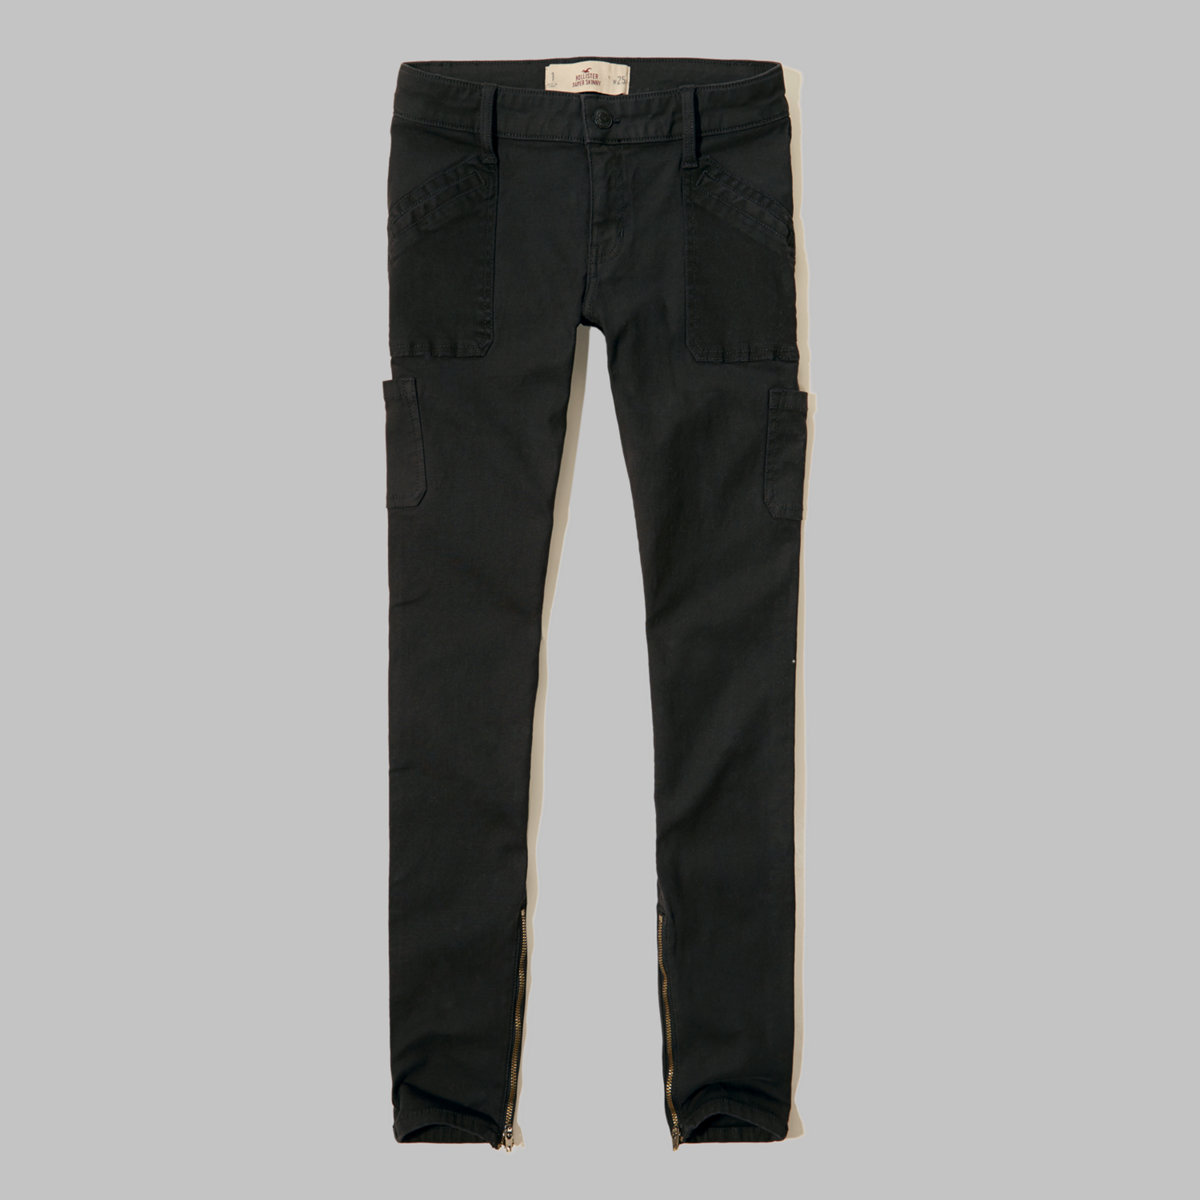 Hollister Super Skinny Twill Pants